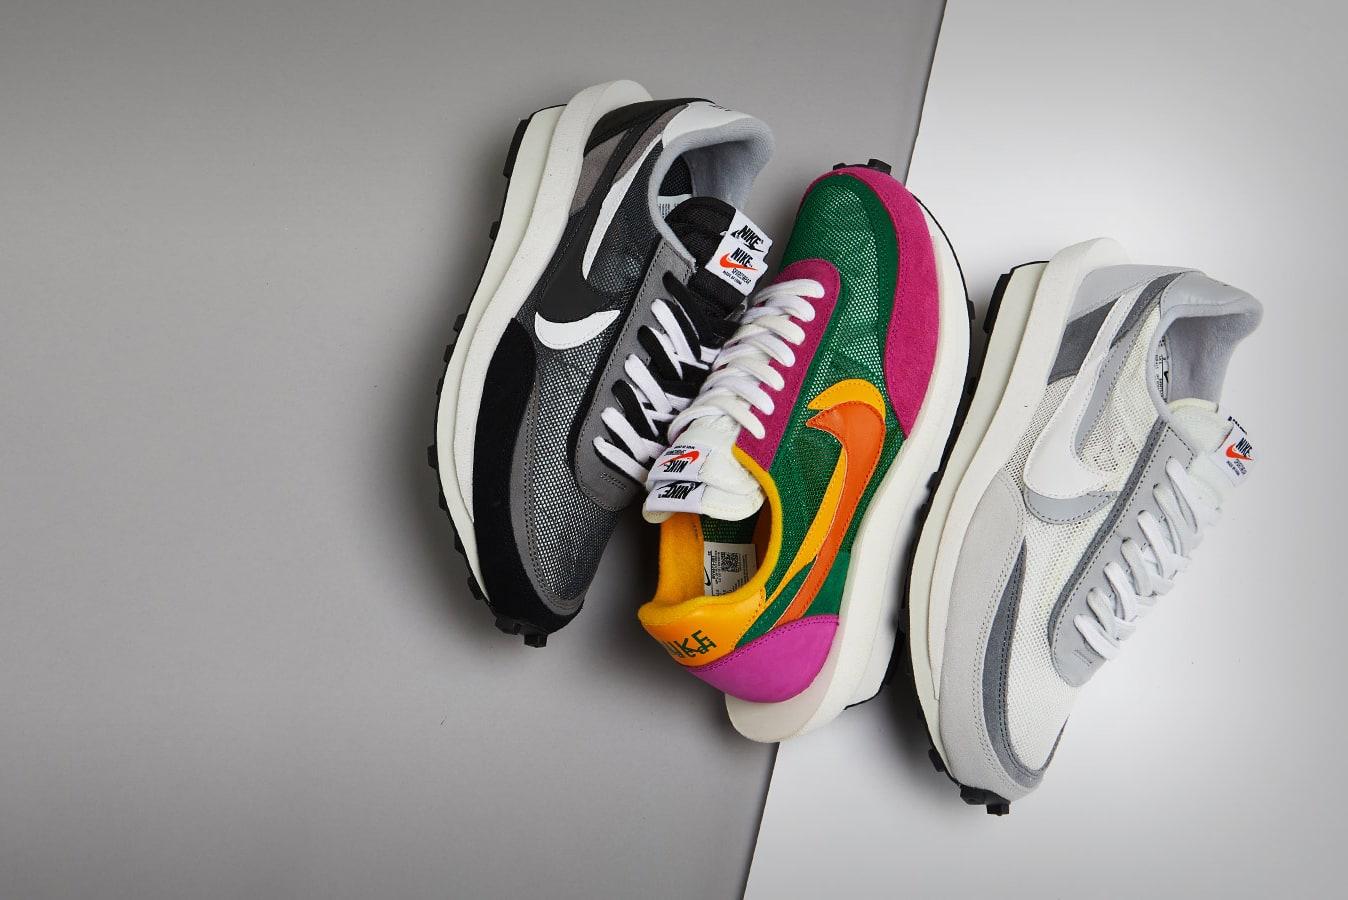 Tienda online liberar información sobre buena textura END. Features   Nike x Sacai LDWaffle - Register Now on END. Launches